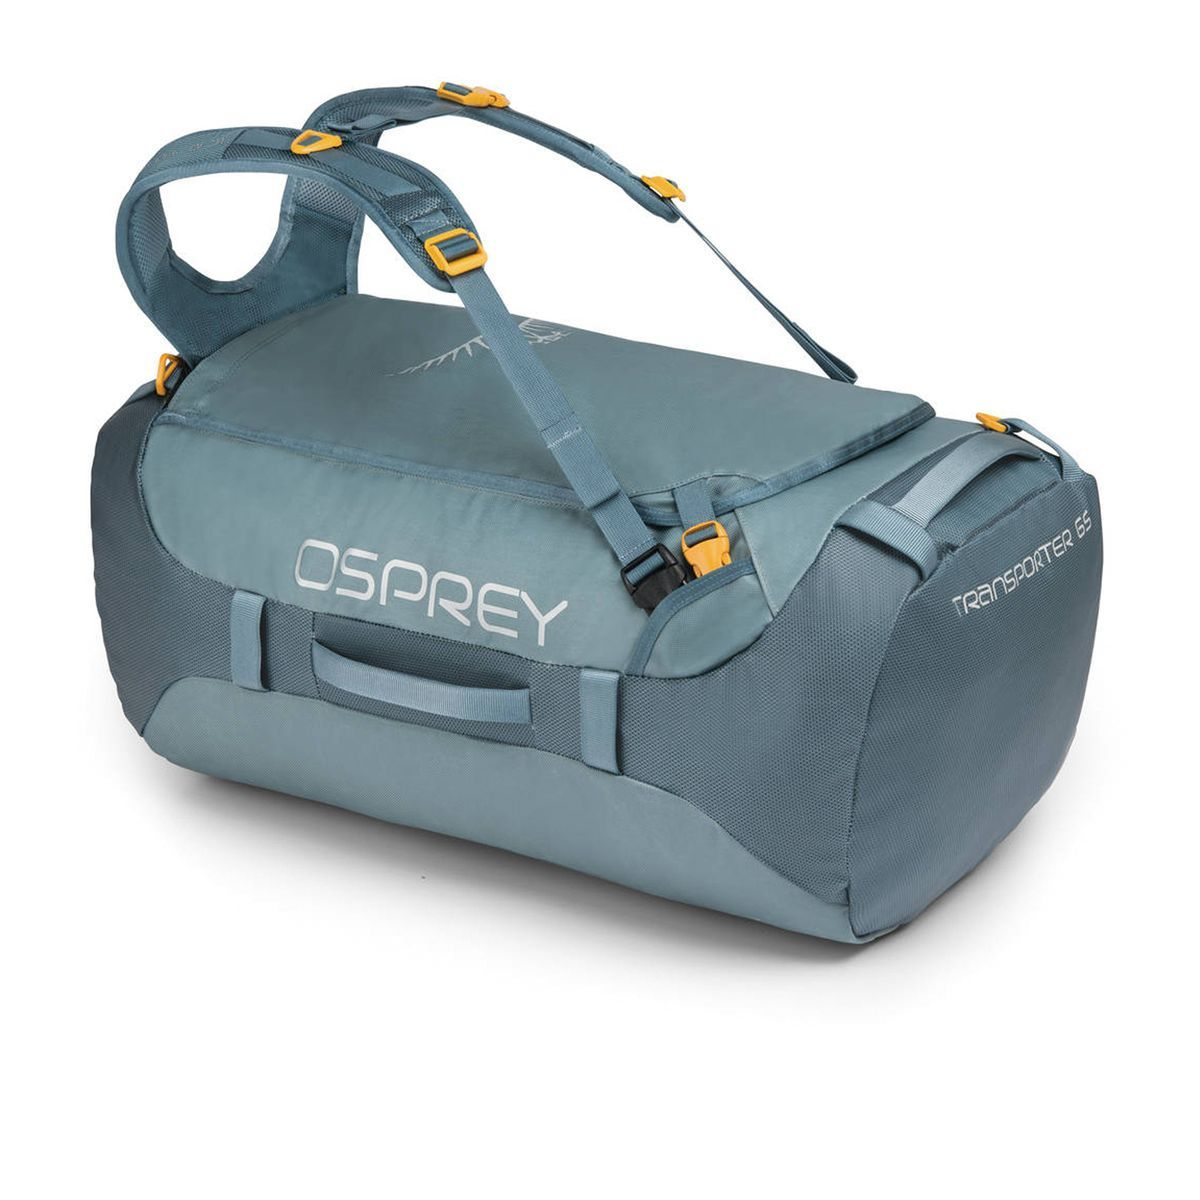 d03c9aadd Osprey Transporter 65 Gear Bag | For Australia | Bags, Osprey bag ...